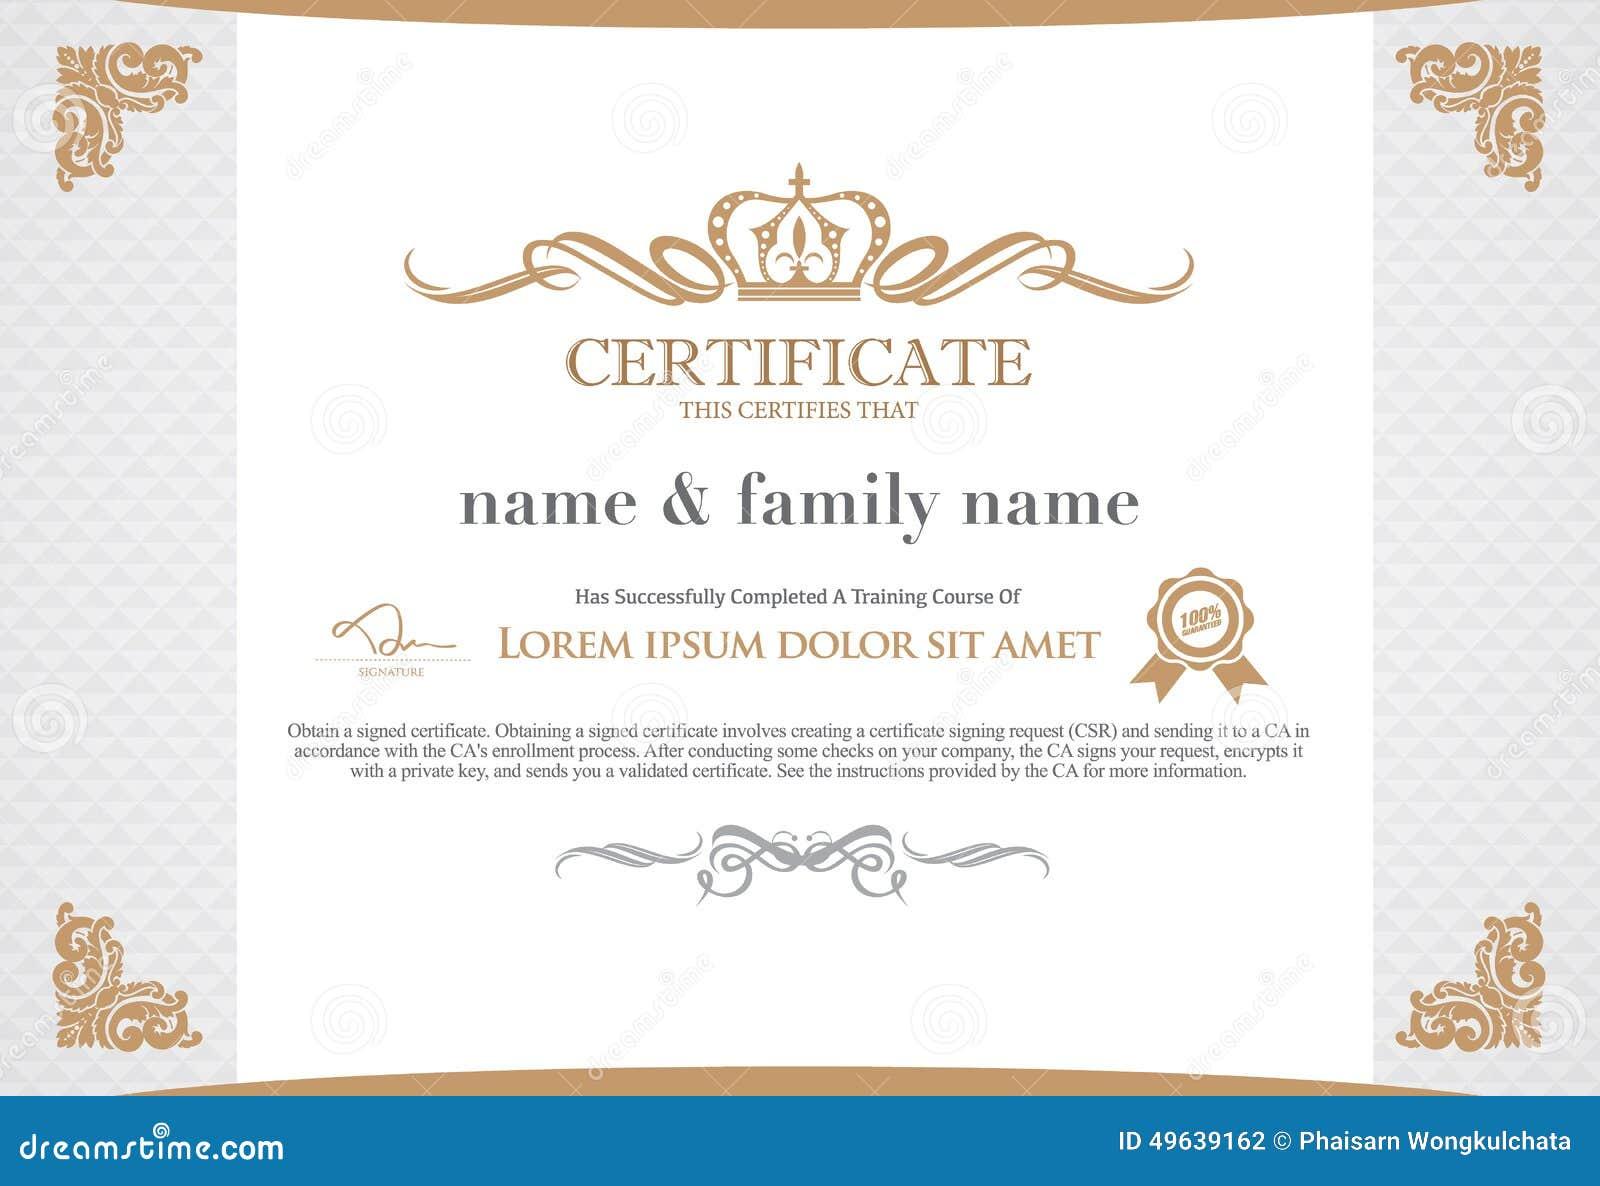 Ziemlich Zertifikat Ai Template Bilder - zertifizierungsstelle ...